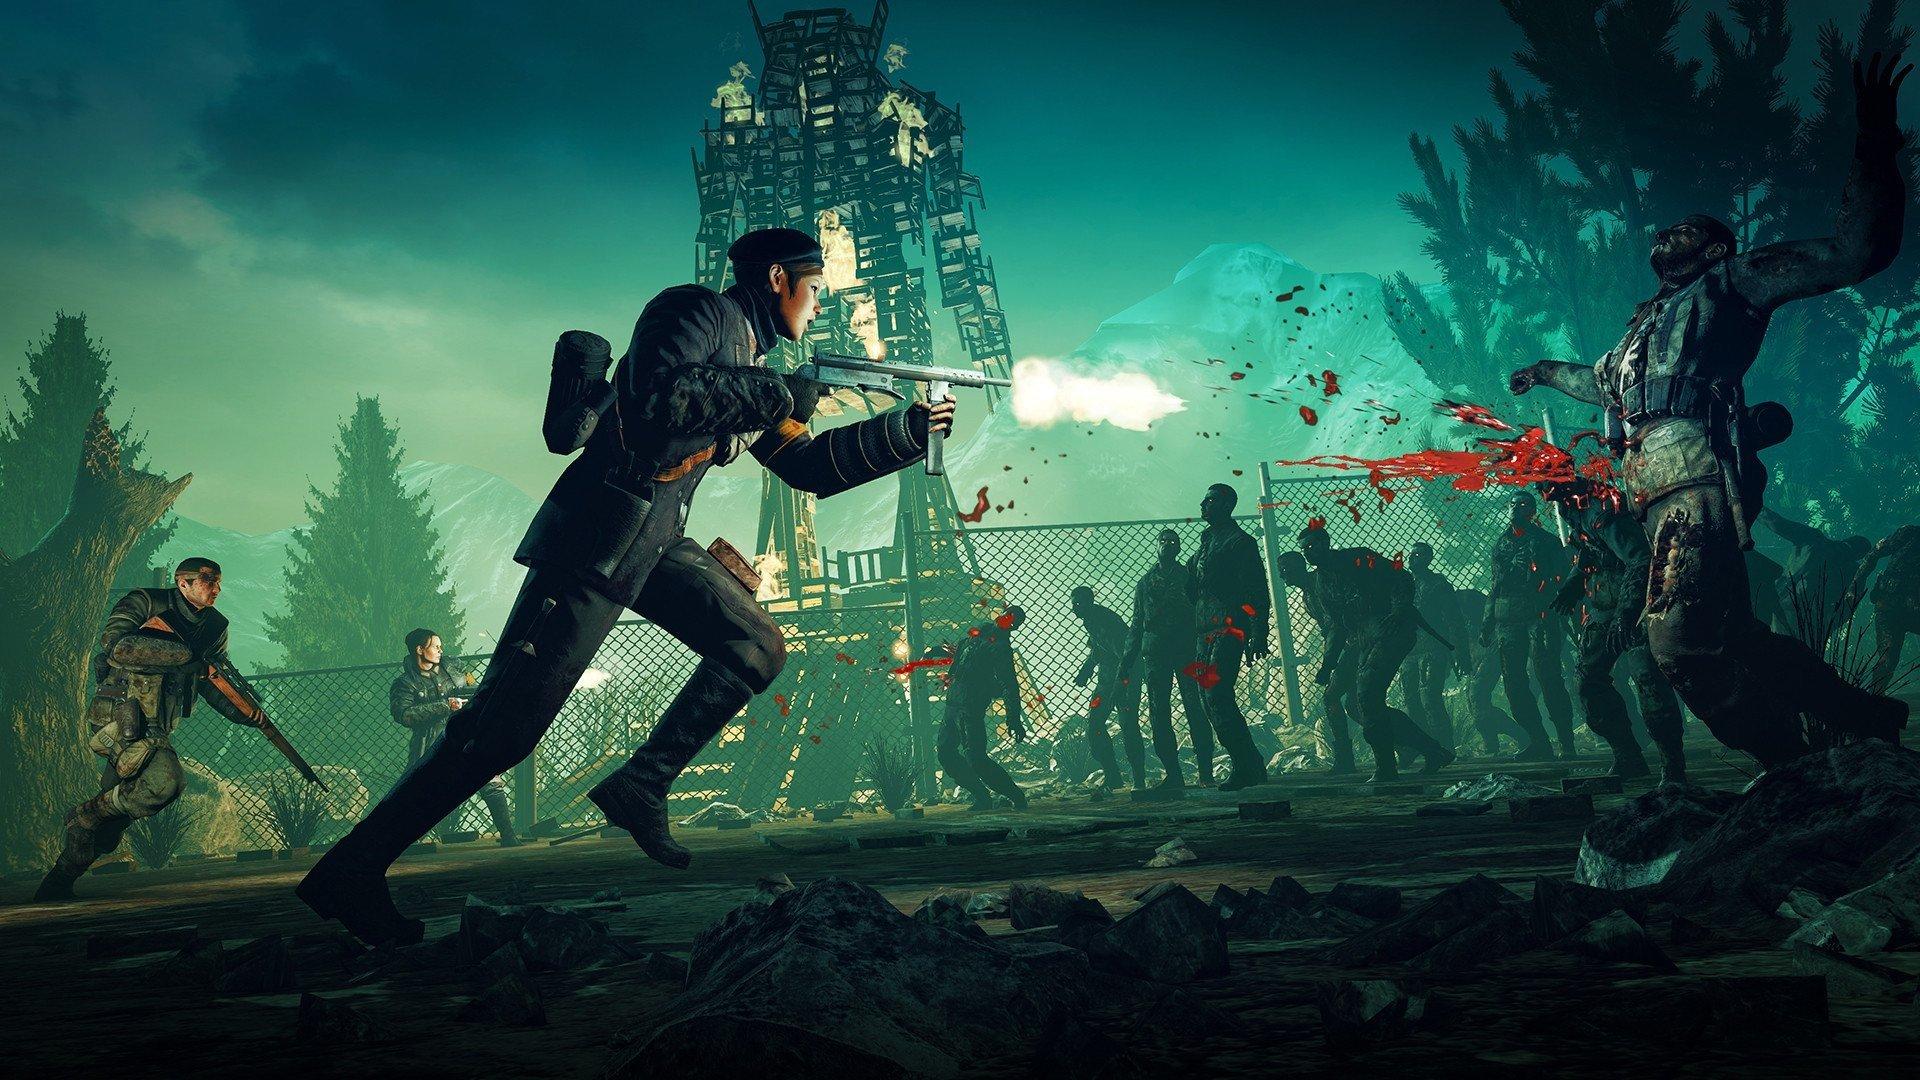 Nazi Zombie Army Hd Wallpapers Zombie Army Trilogy Art